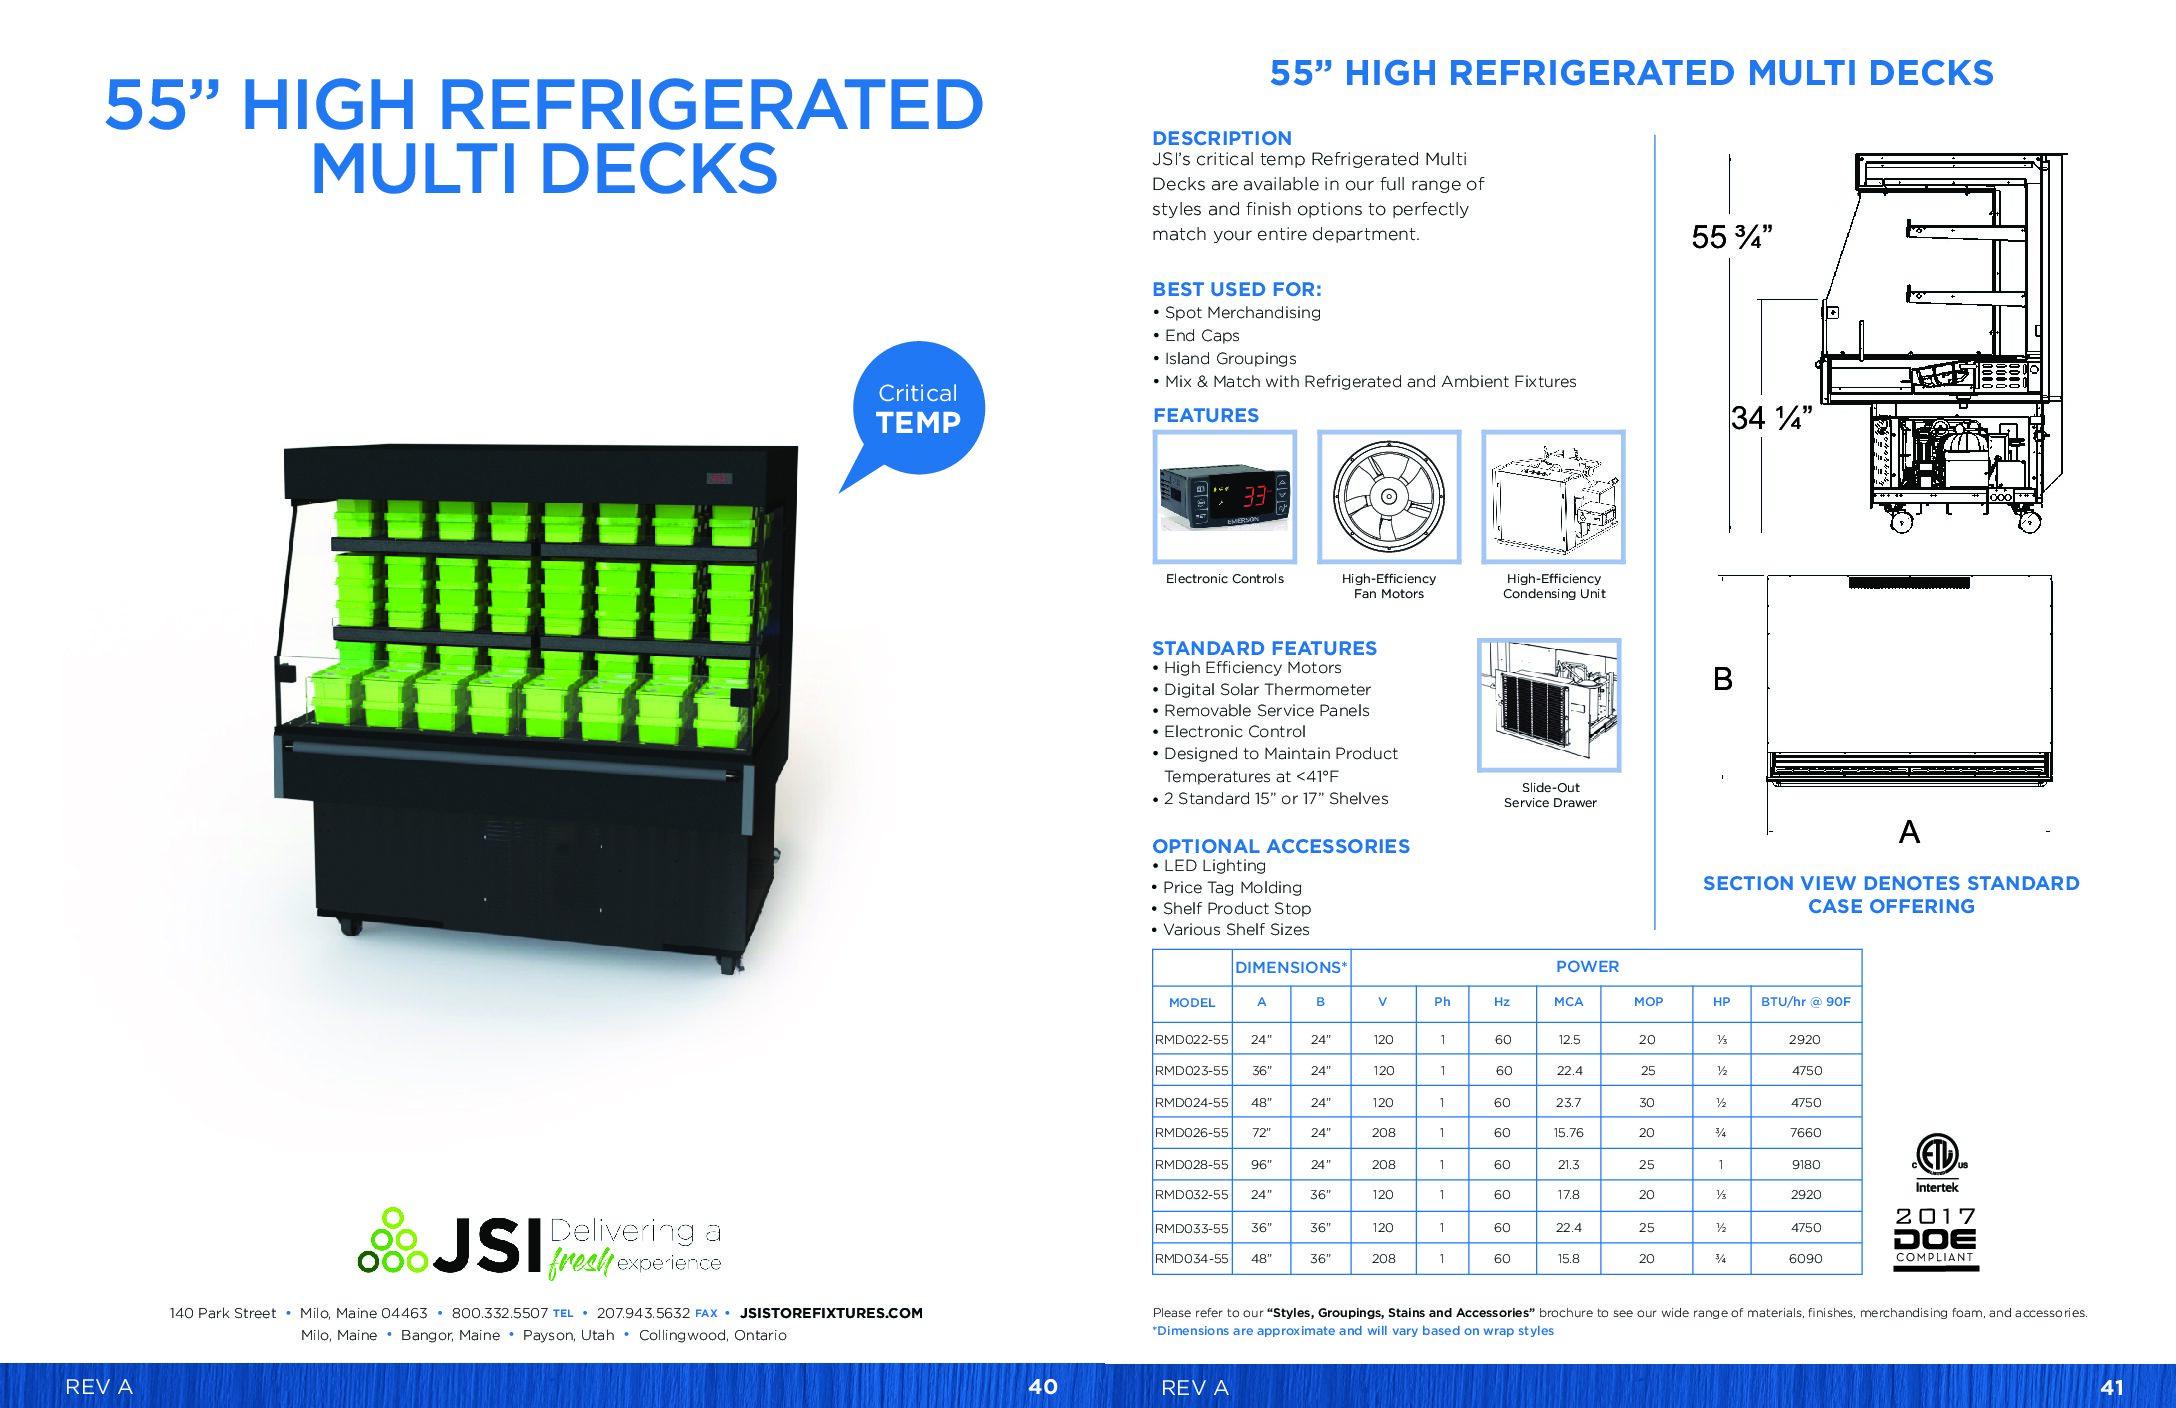 55in High Refrigerated Multi Decks (PDF)